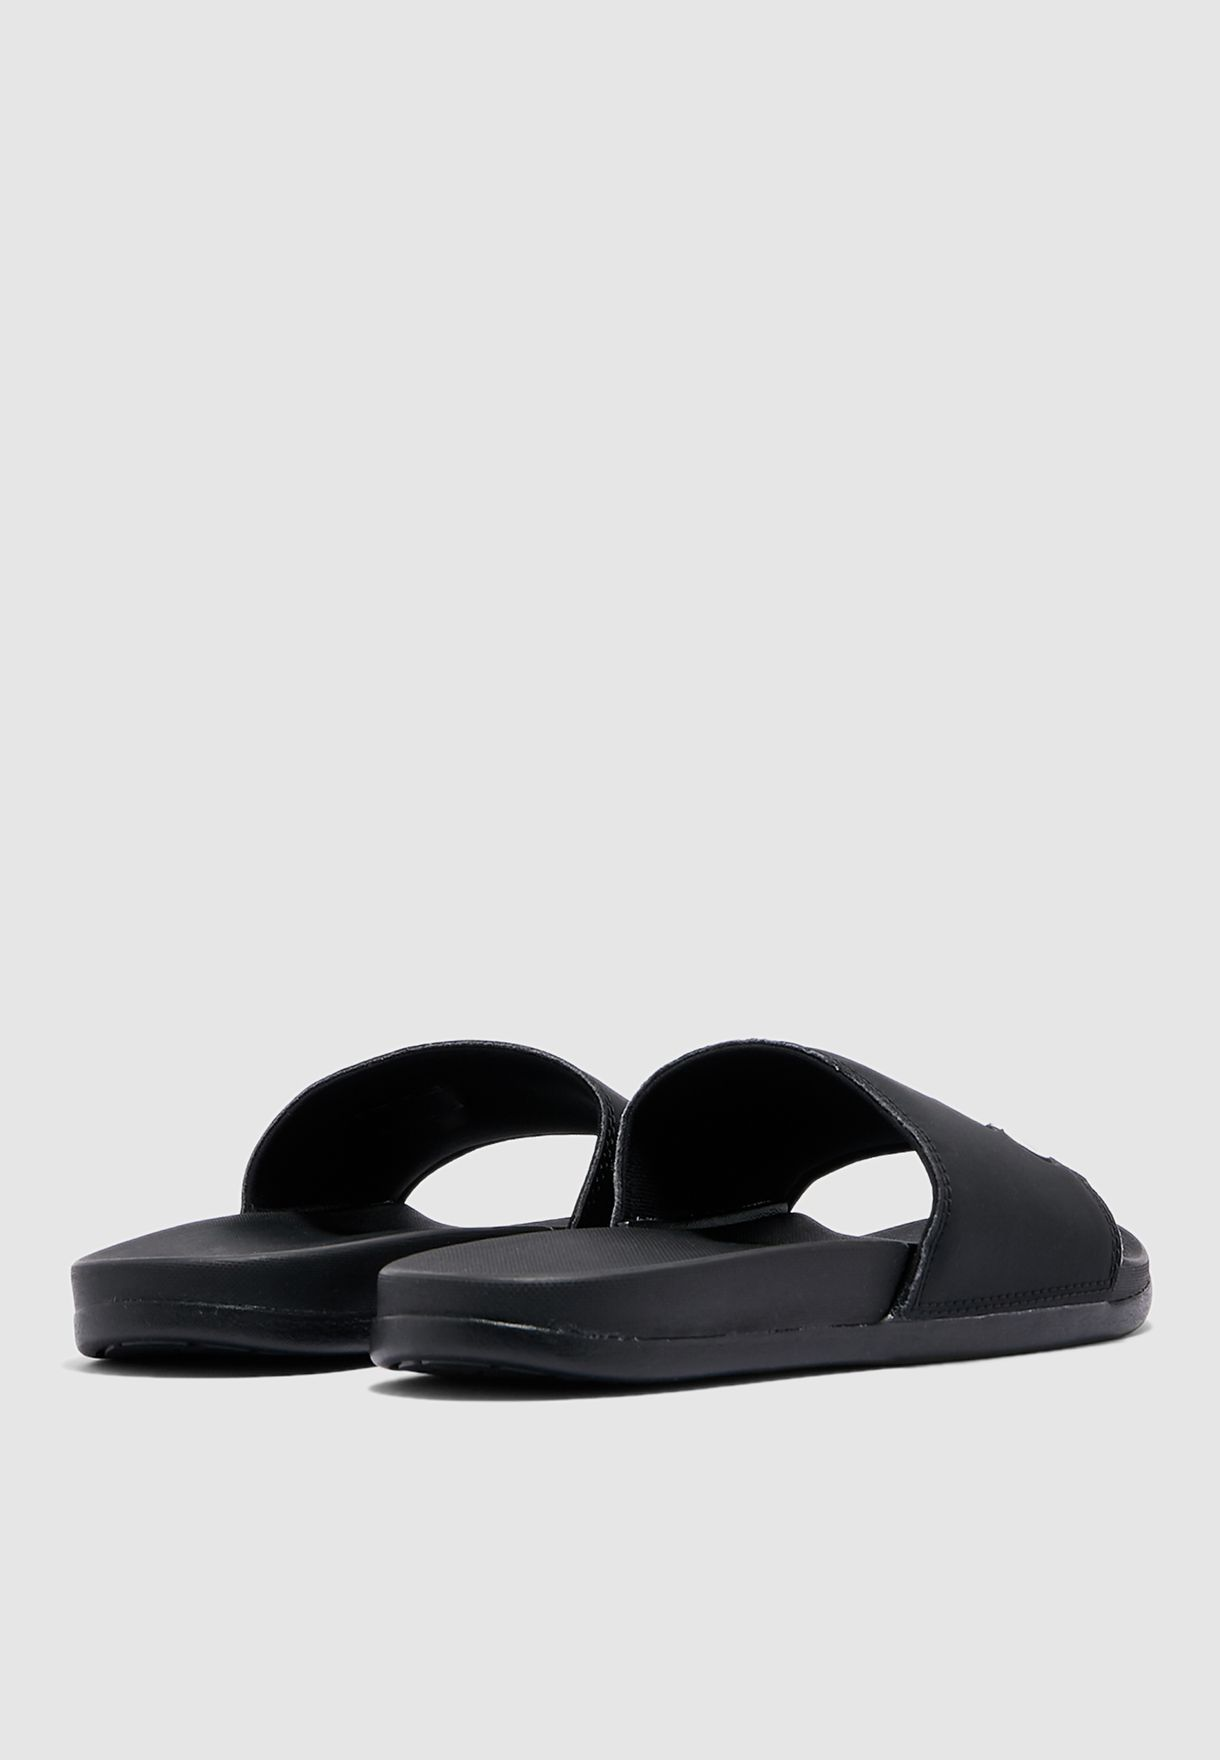 Adilette Comfort Sports Swim Men's Slides